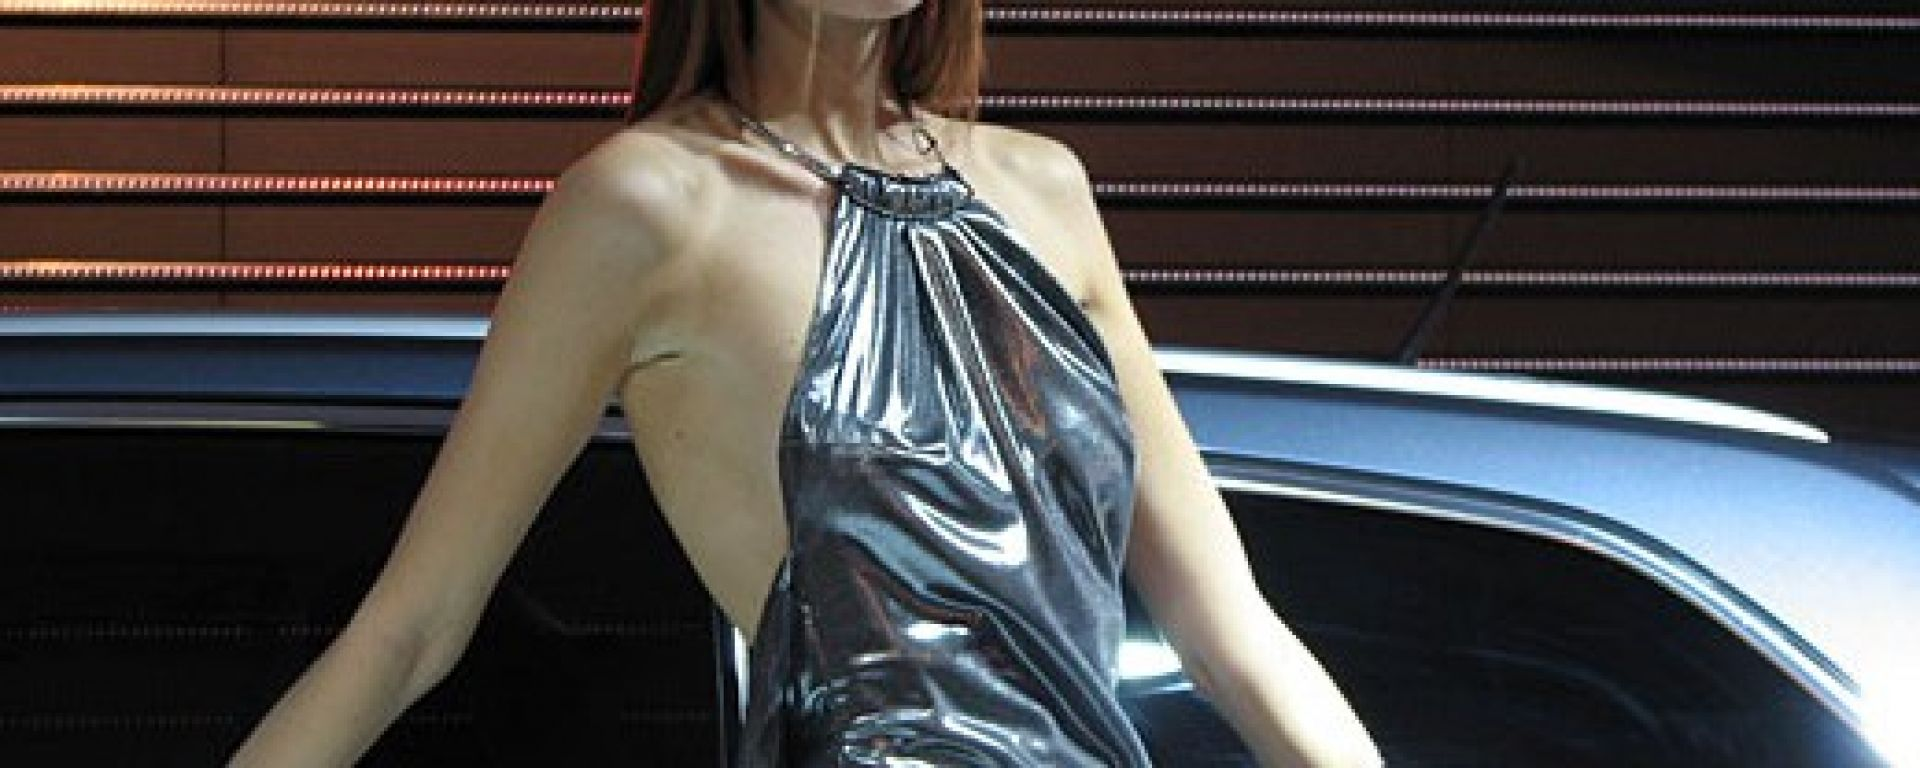 Motor Show 2008: Gallery 1